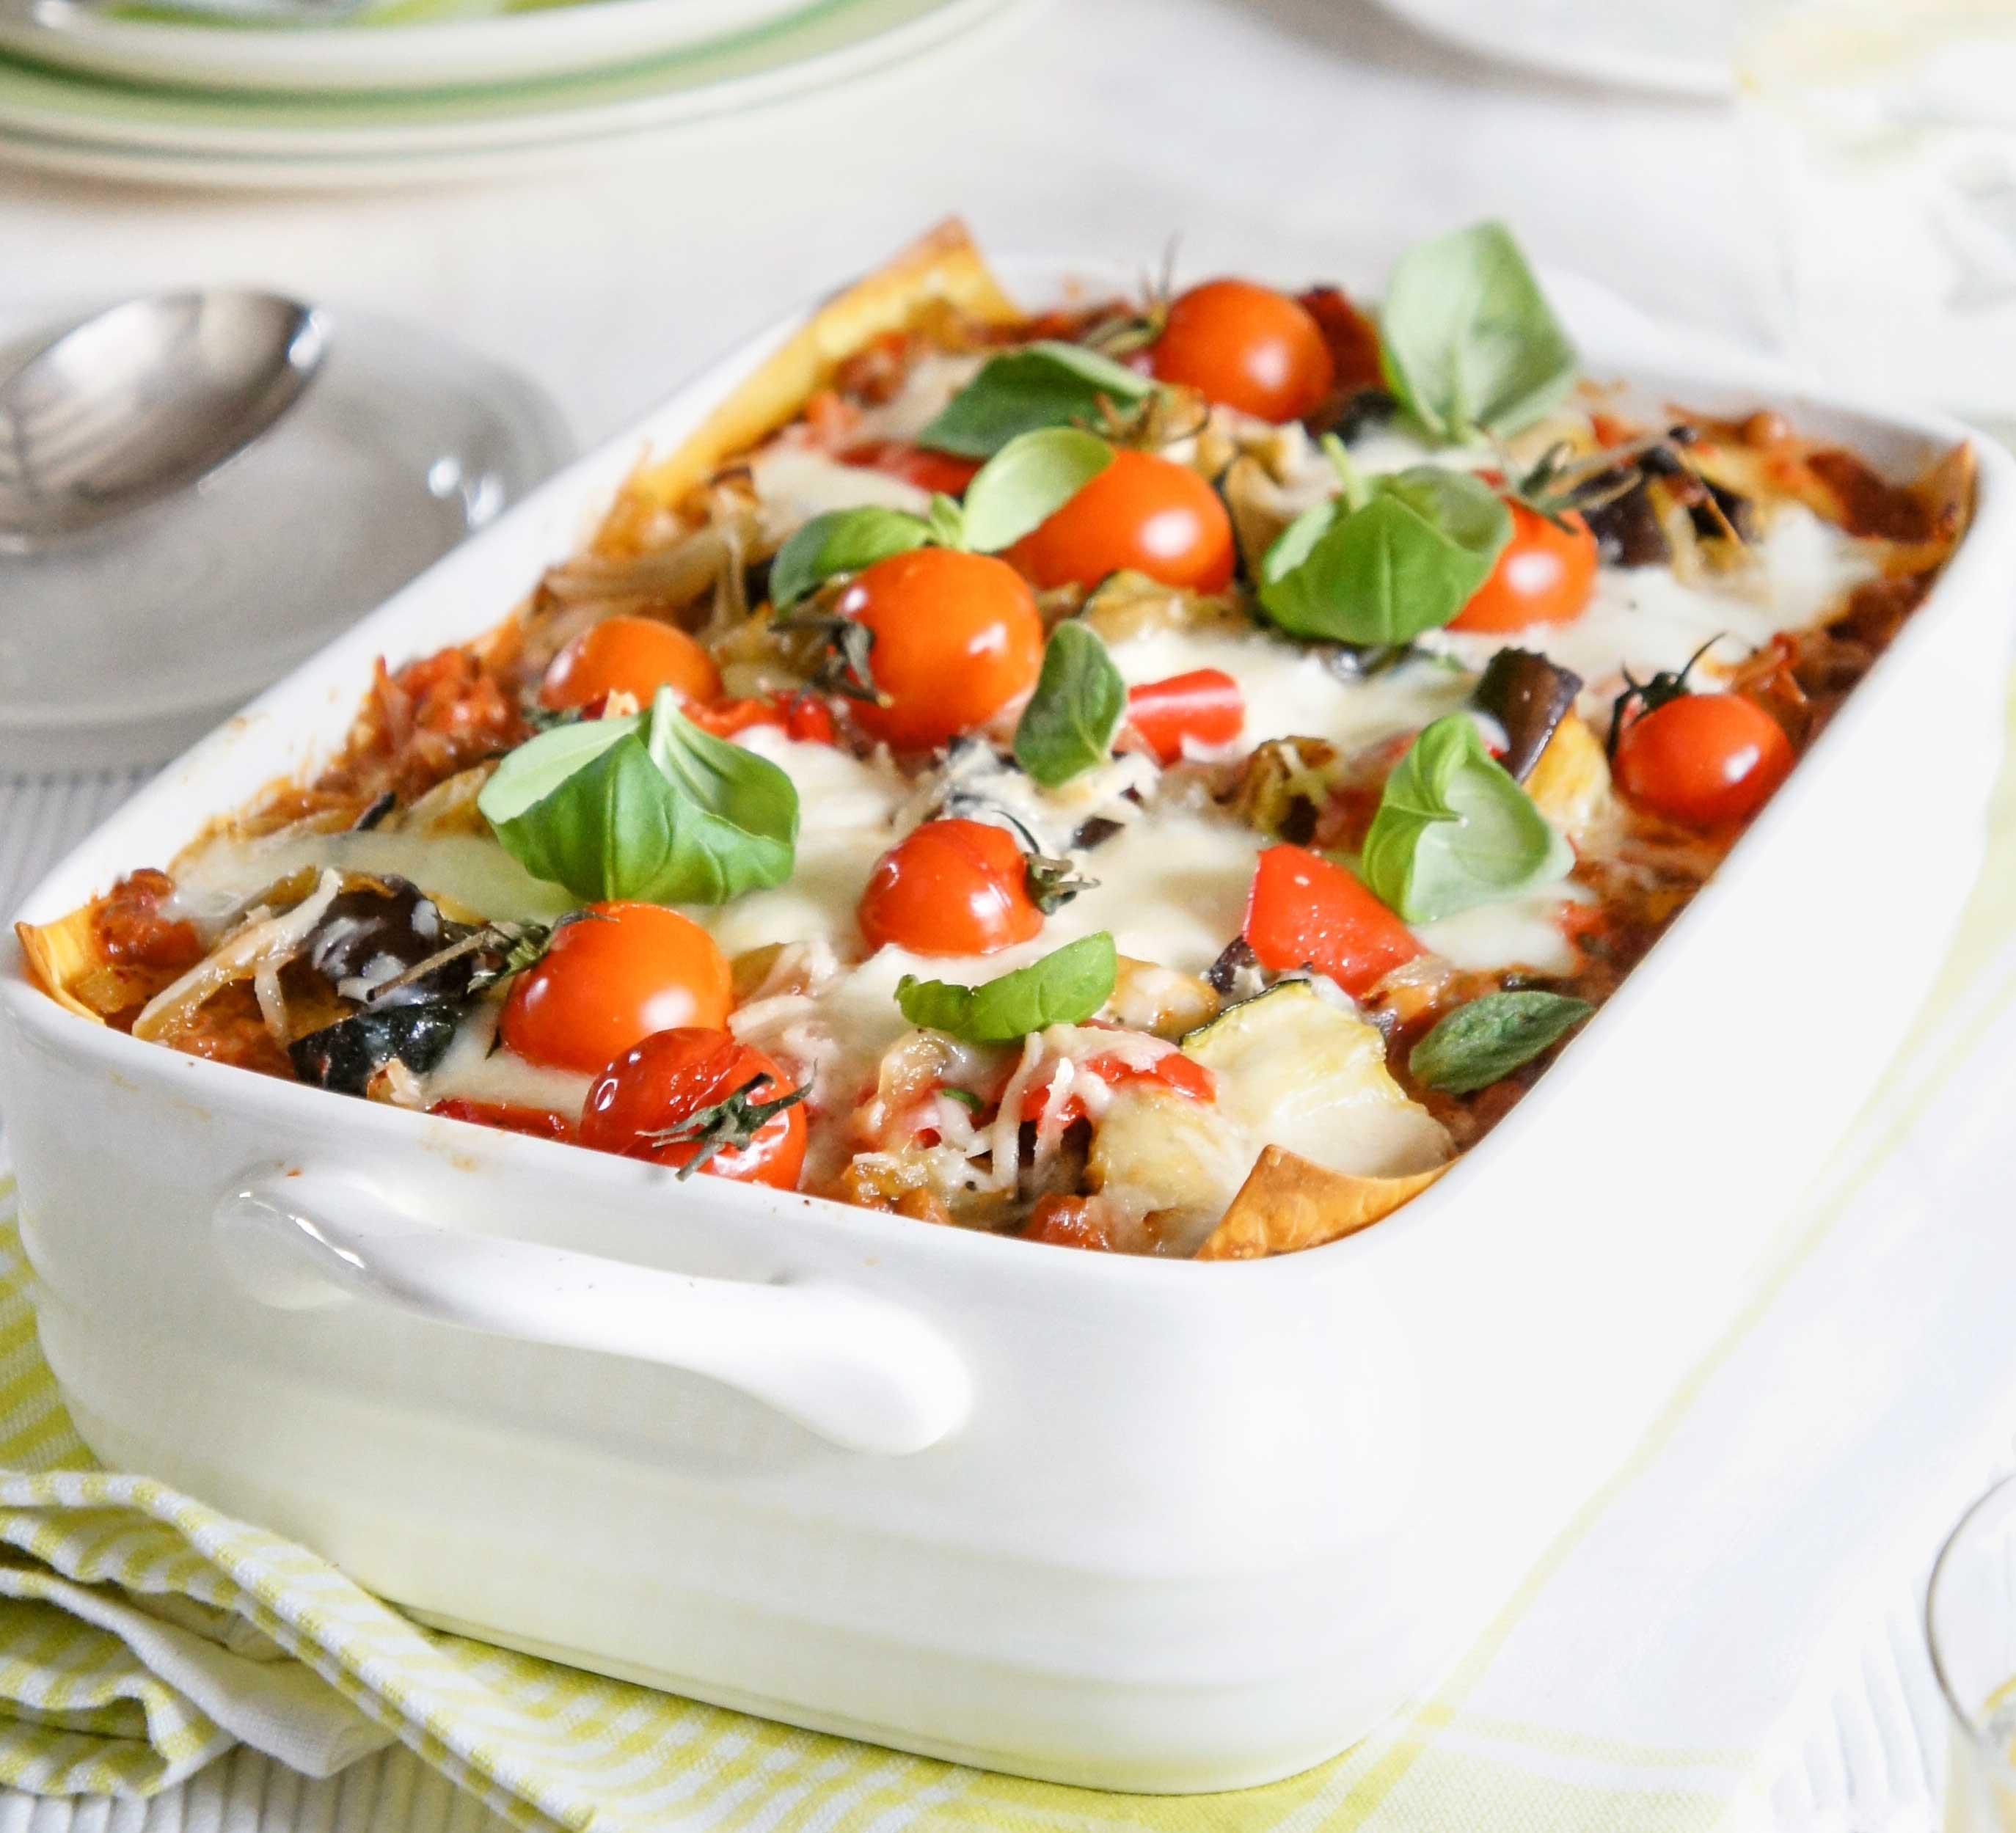 Healthy Vegetable Lasagna  Lighter ve able lasagne recipe